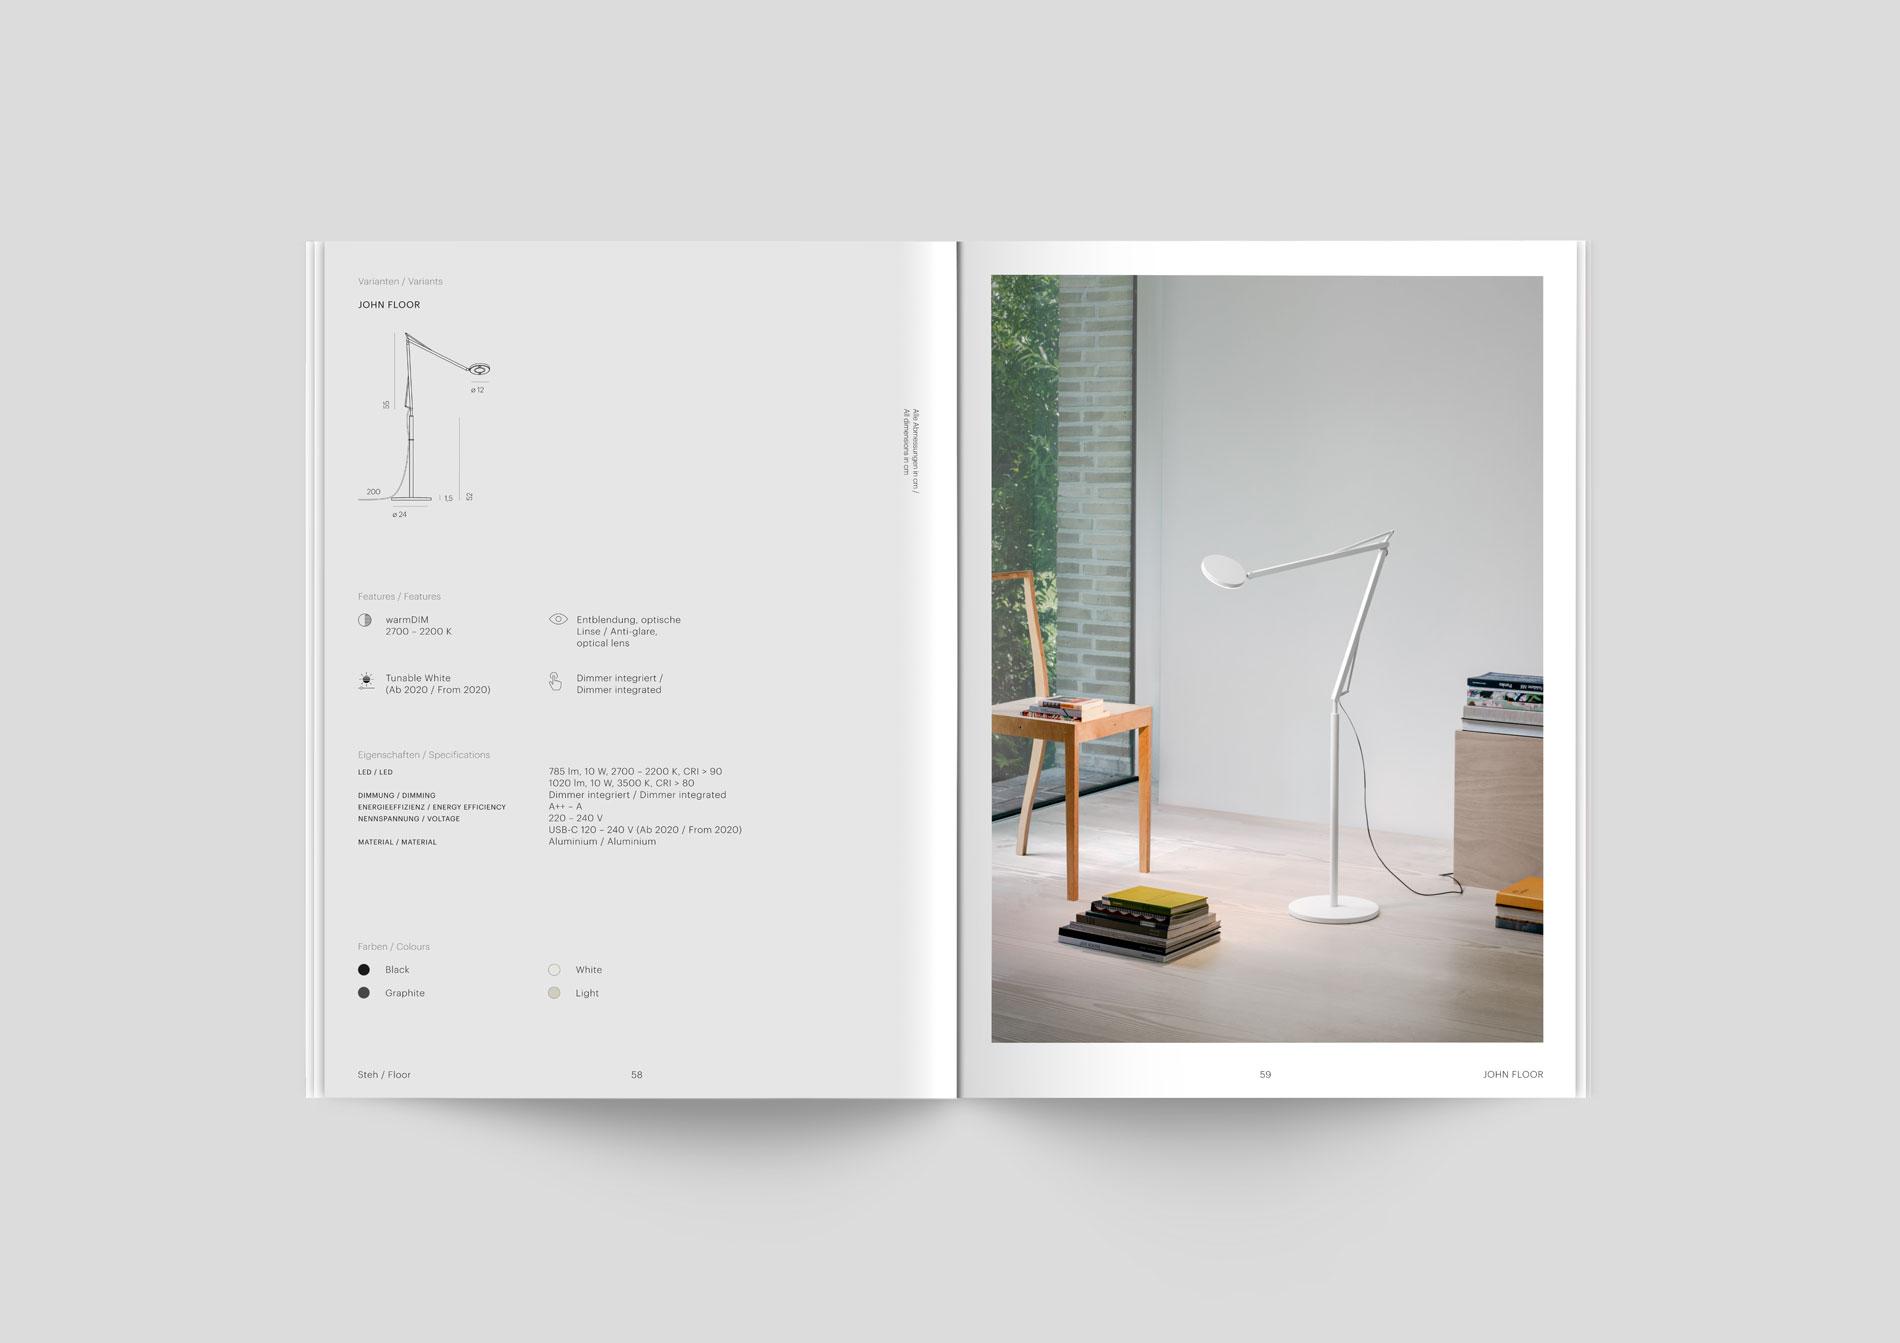 nicoletta-dalfino-tobias-grau-catalogue-2019-08